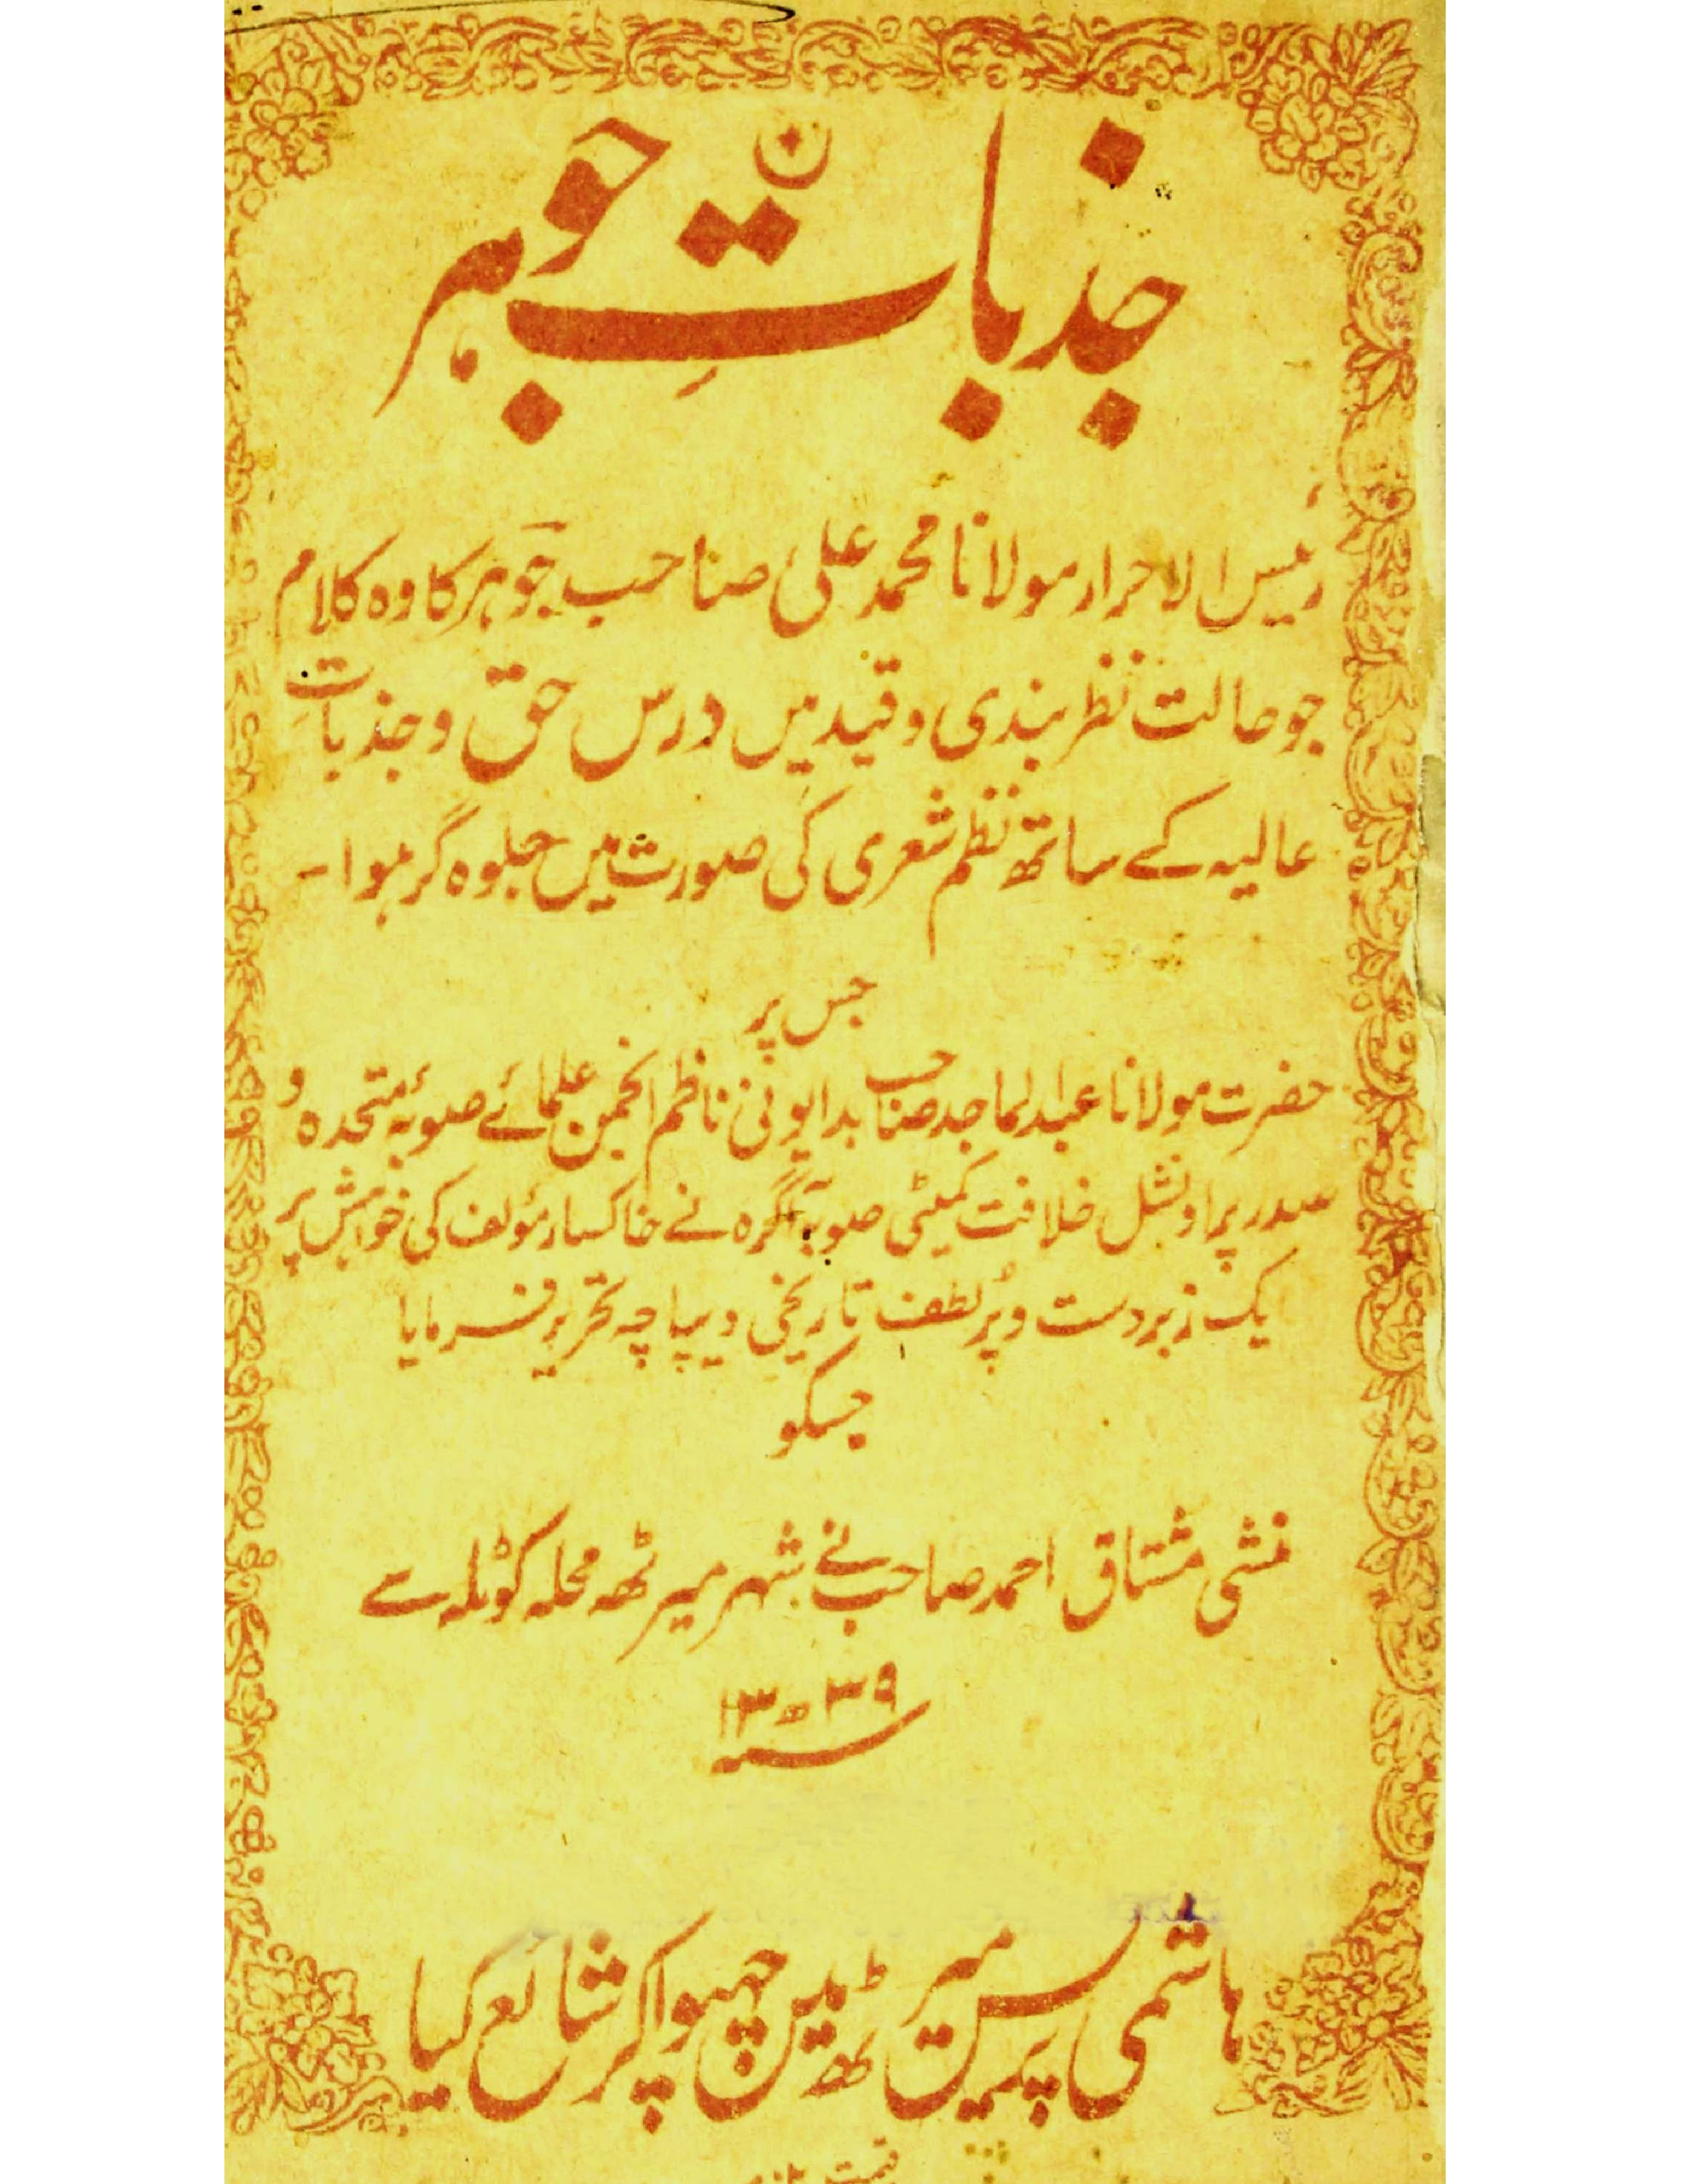 Jazbat-e-Jauhar